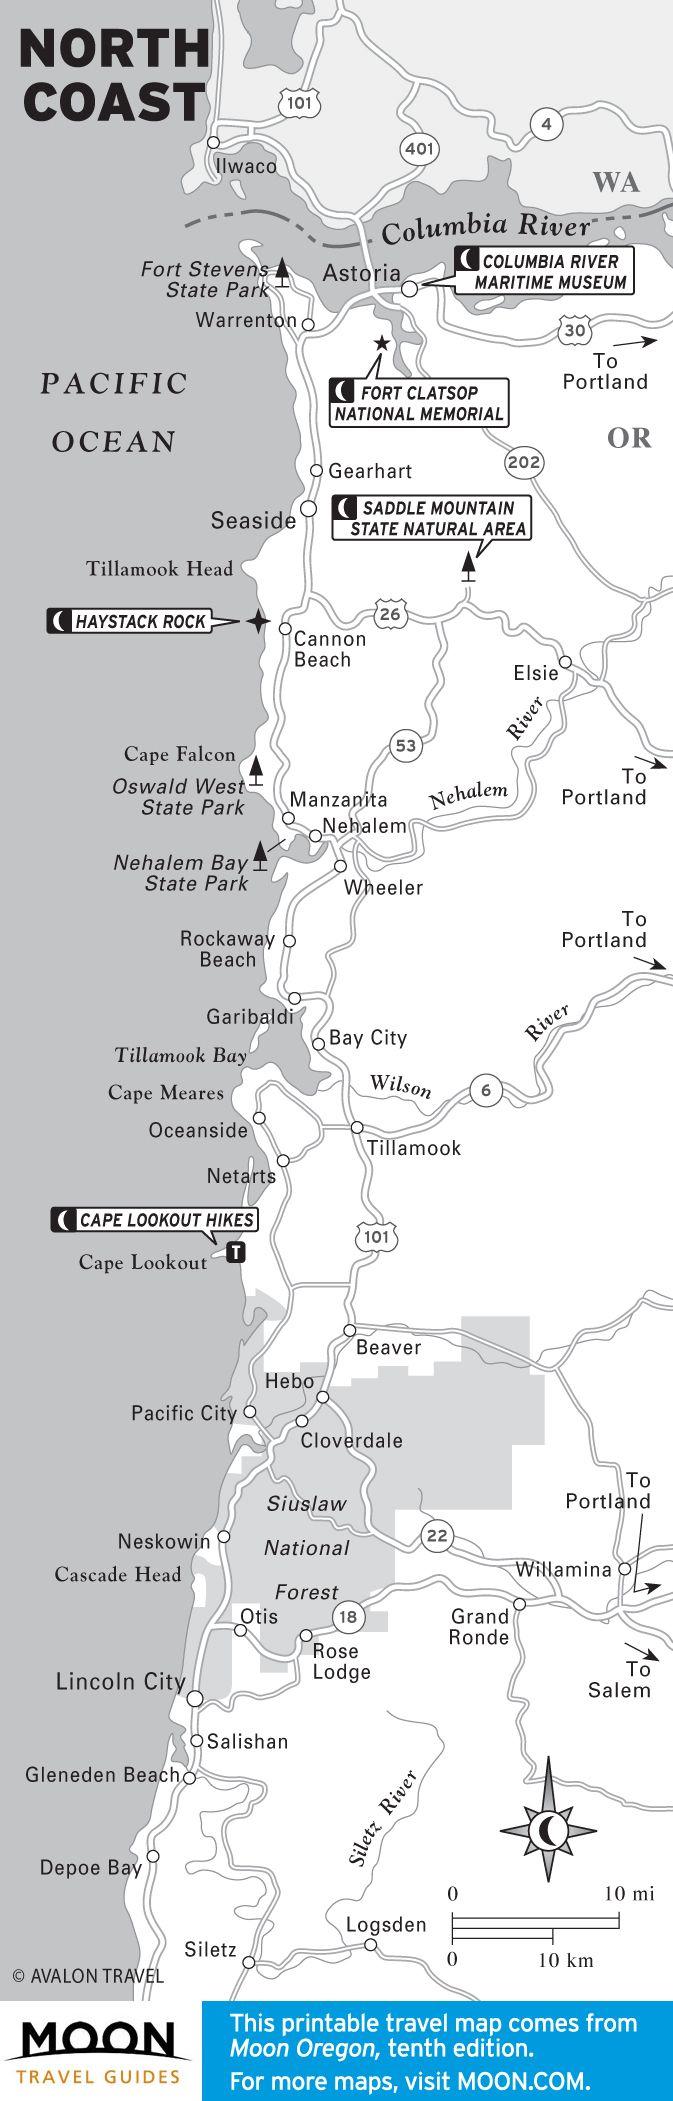 Map of the North Coast of Oregon